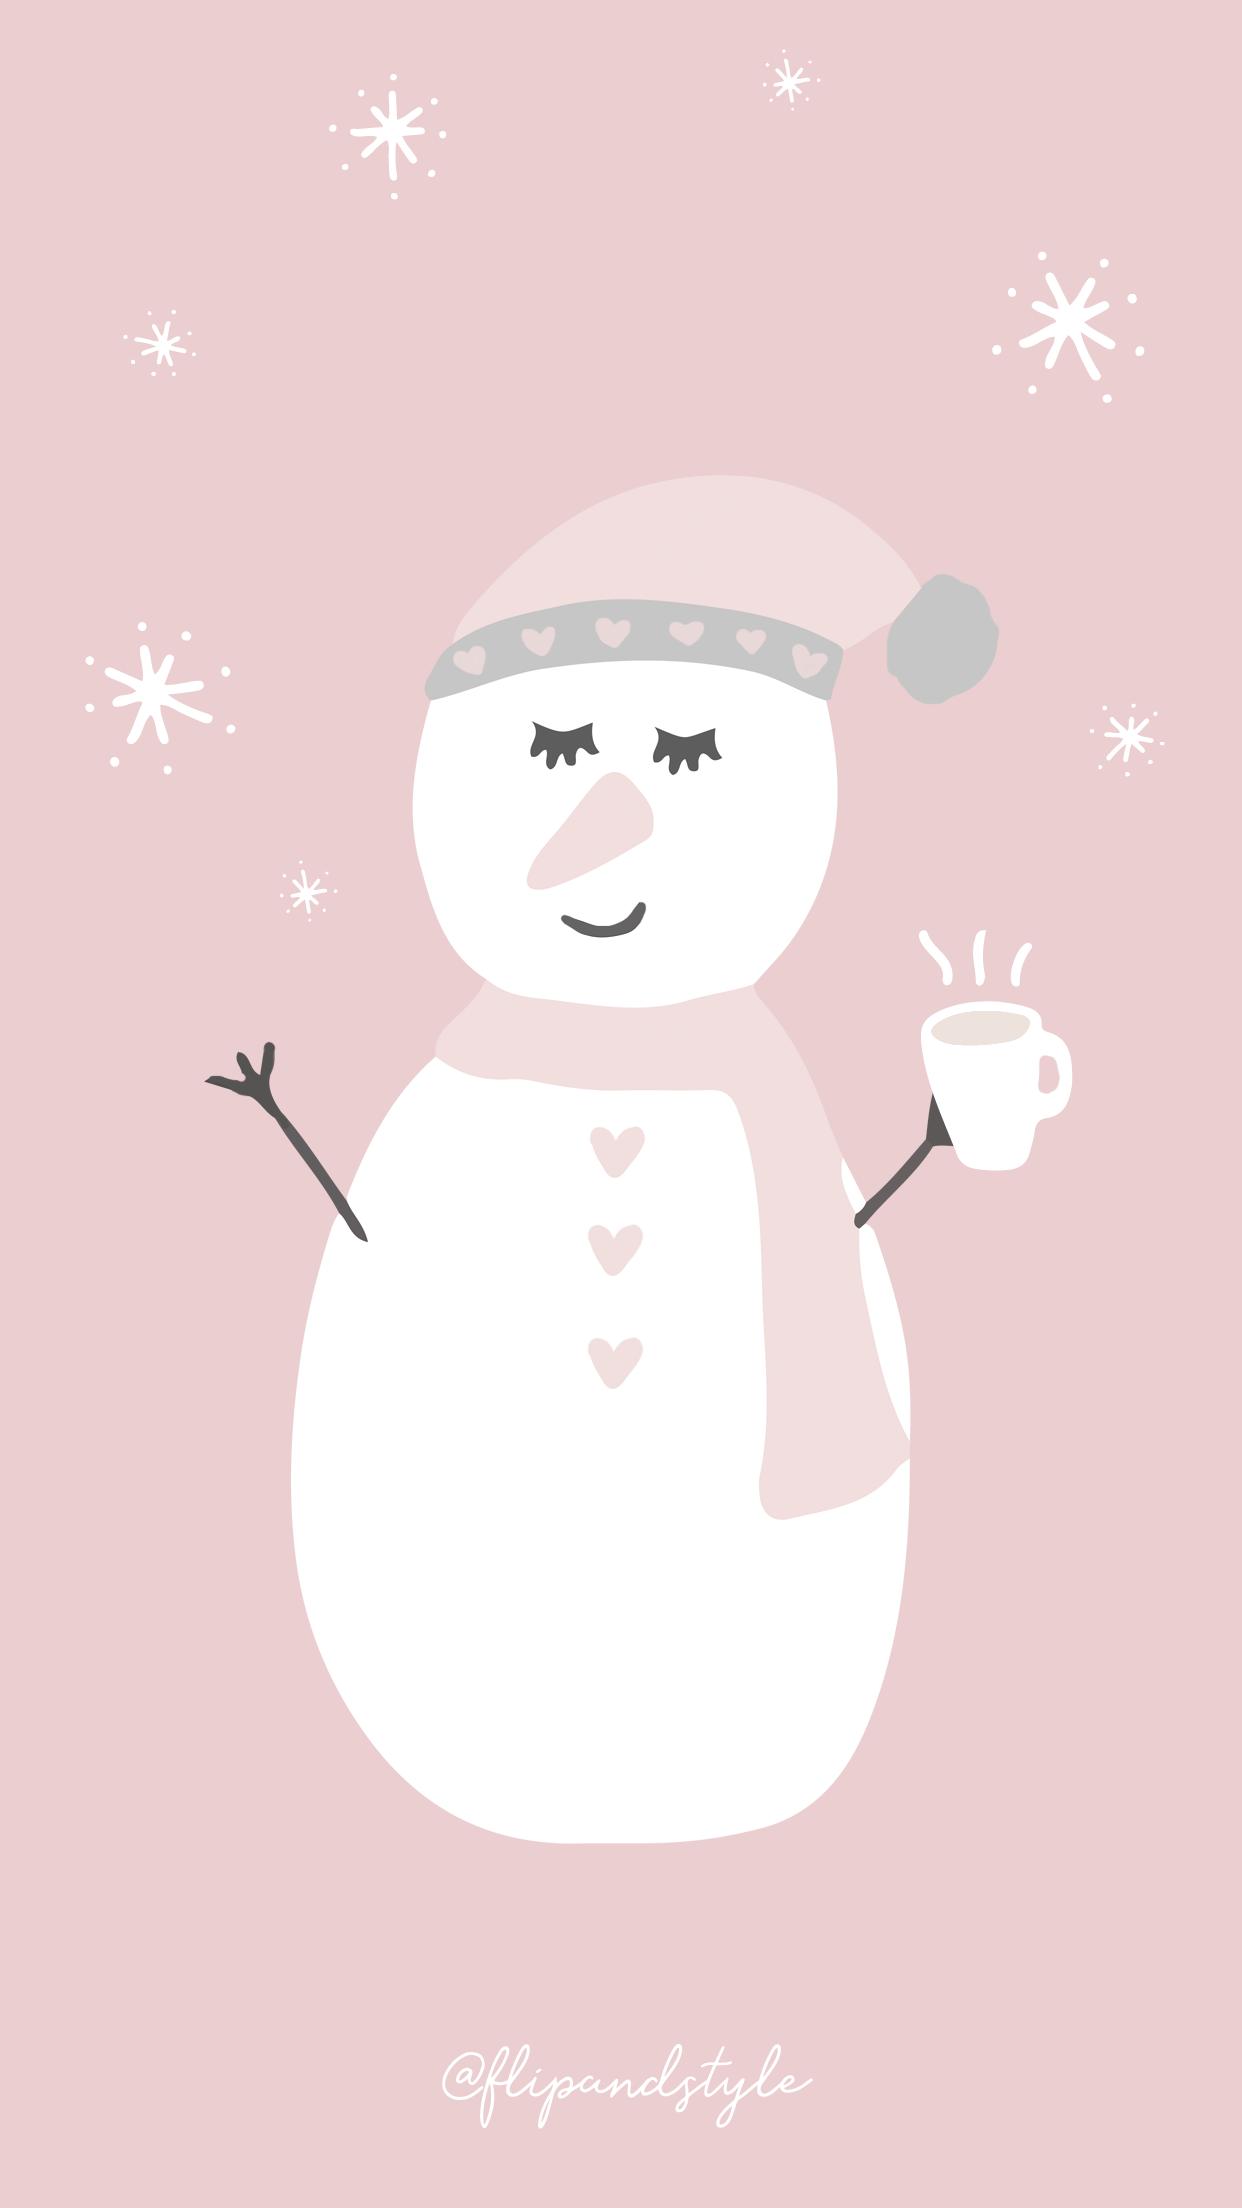 Pin About Fondos Animados Para Celular Y Fondos Navidad On